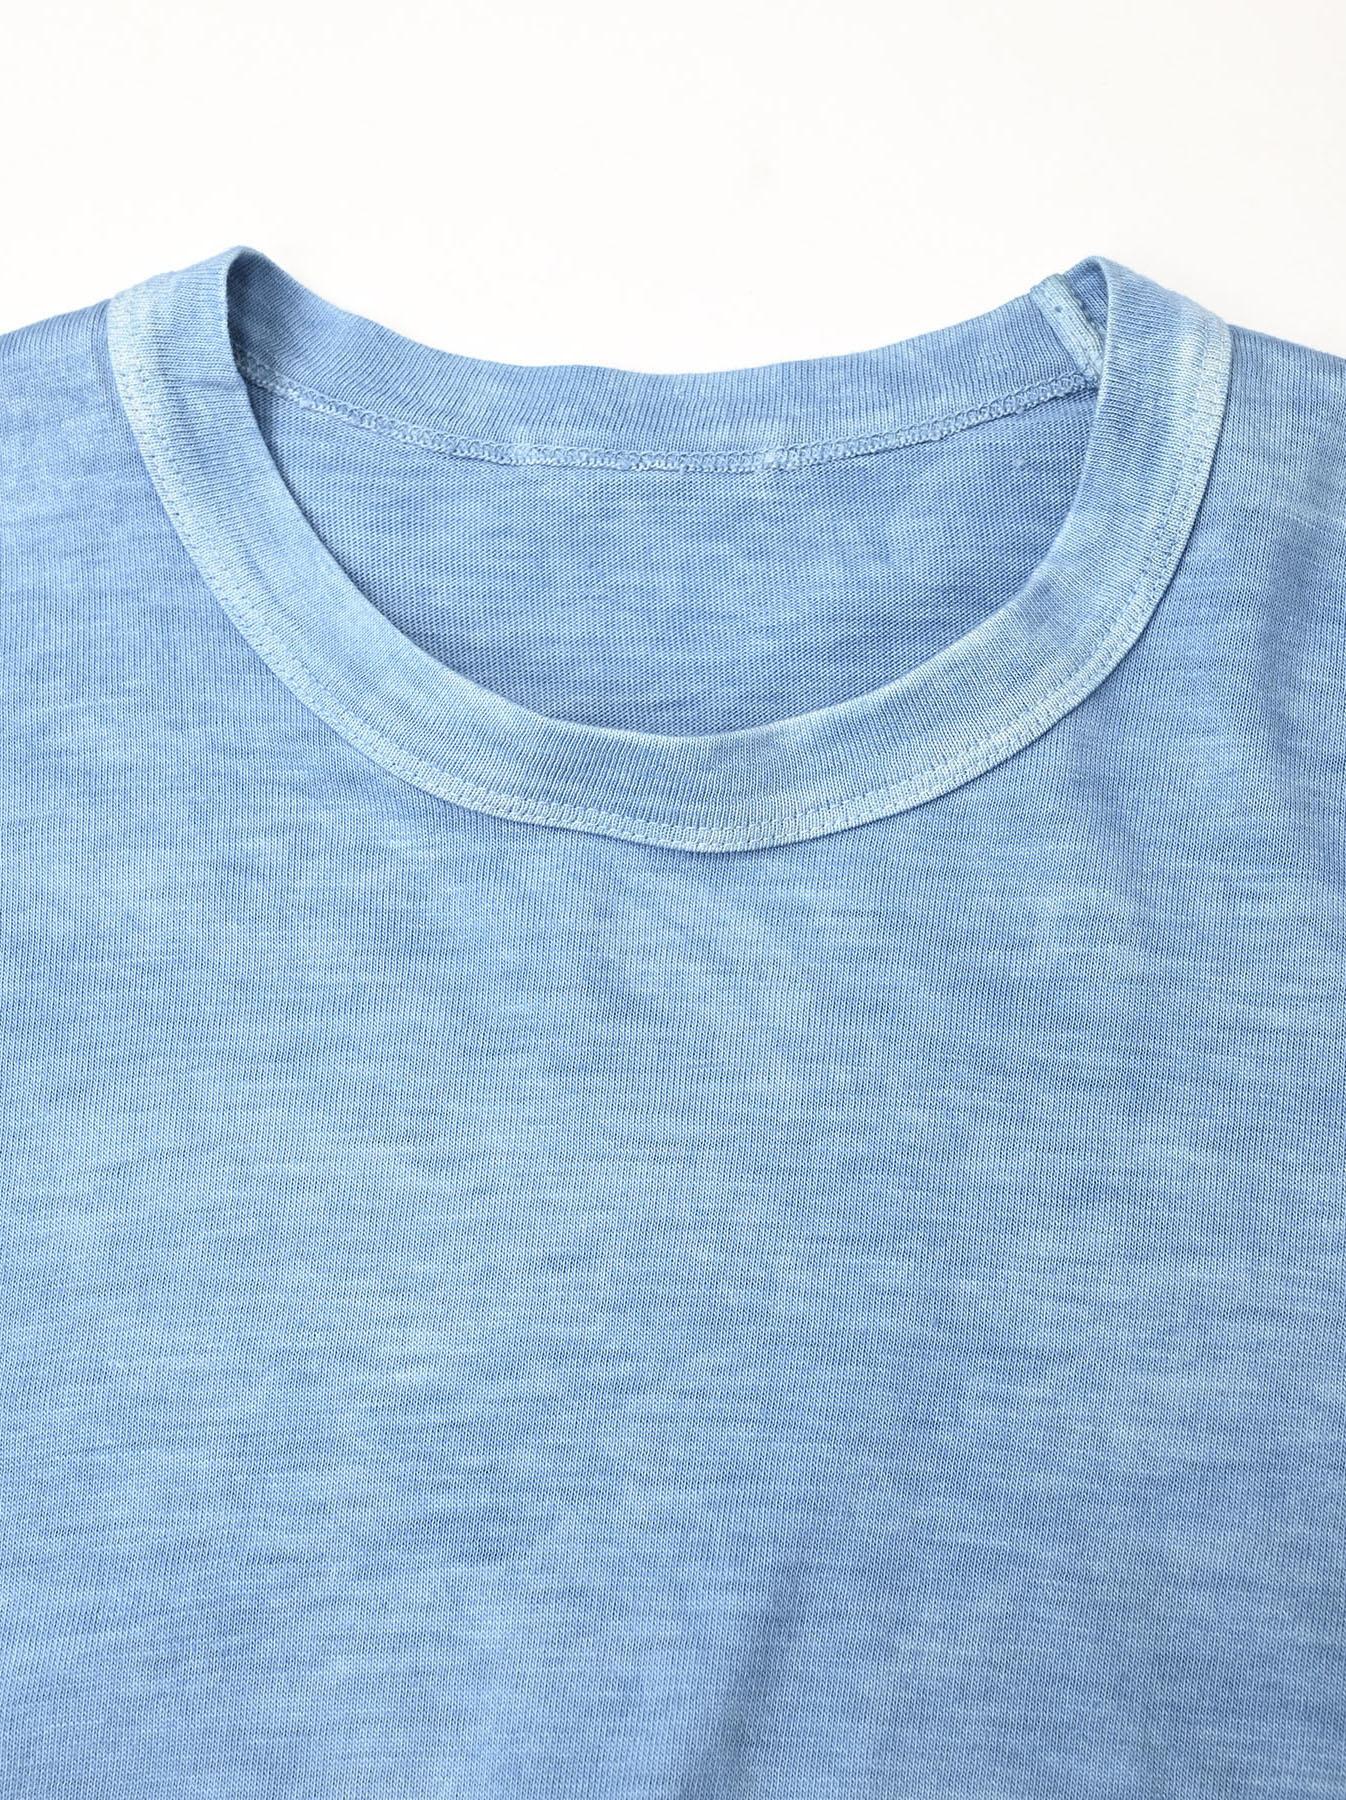 Ai Organic Supima Tenjiku Long-sleeved T-shirt-7